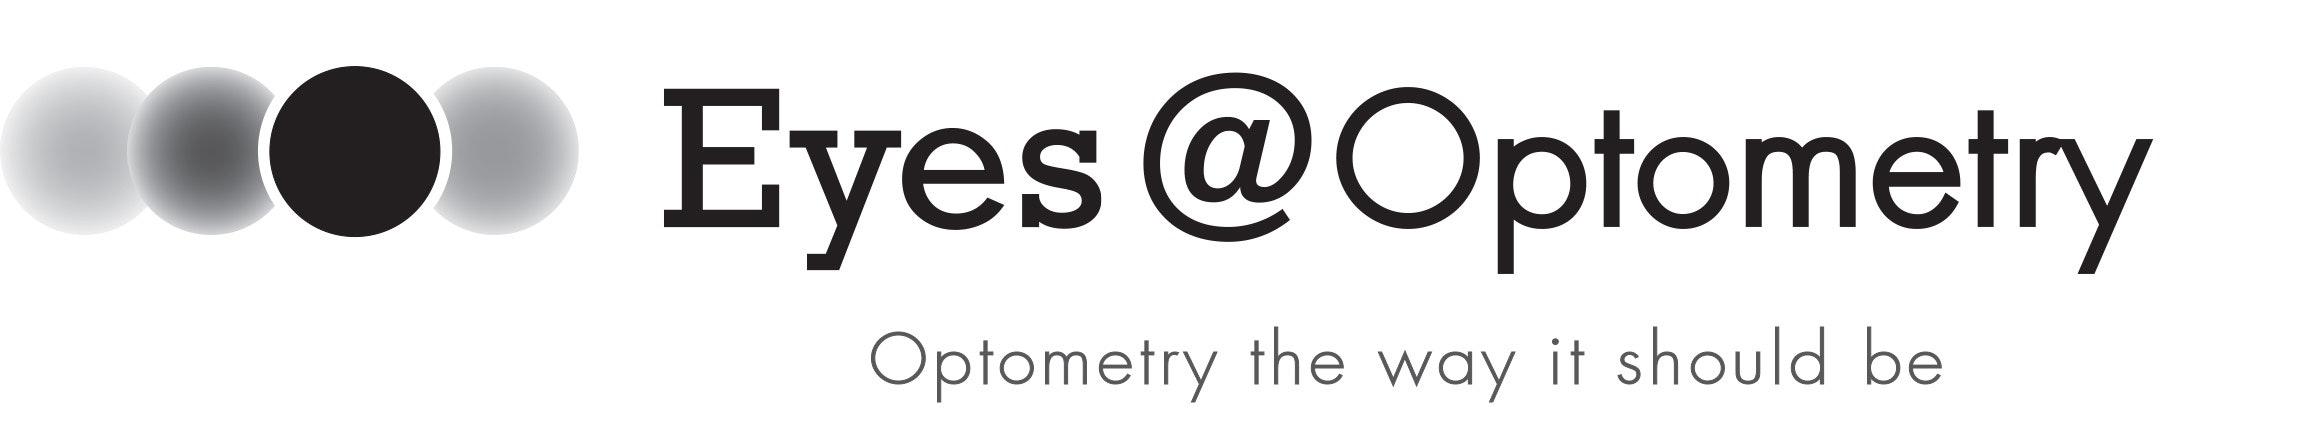 logo for Eyes at Australind Optometrists